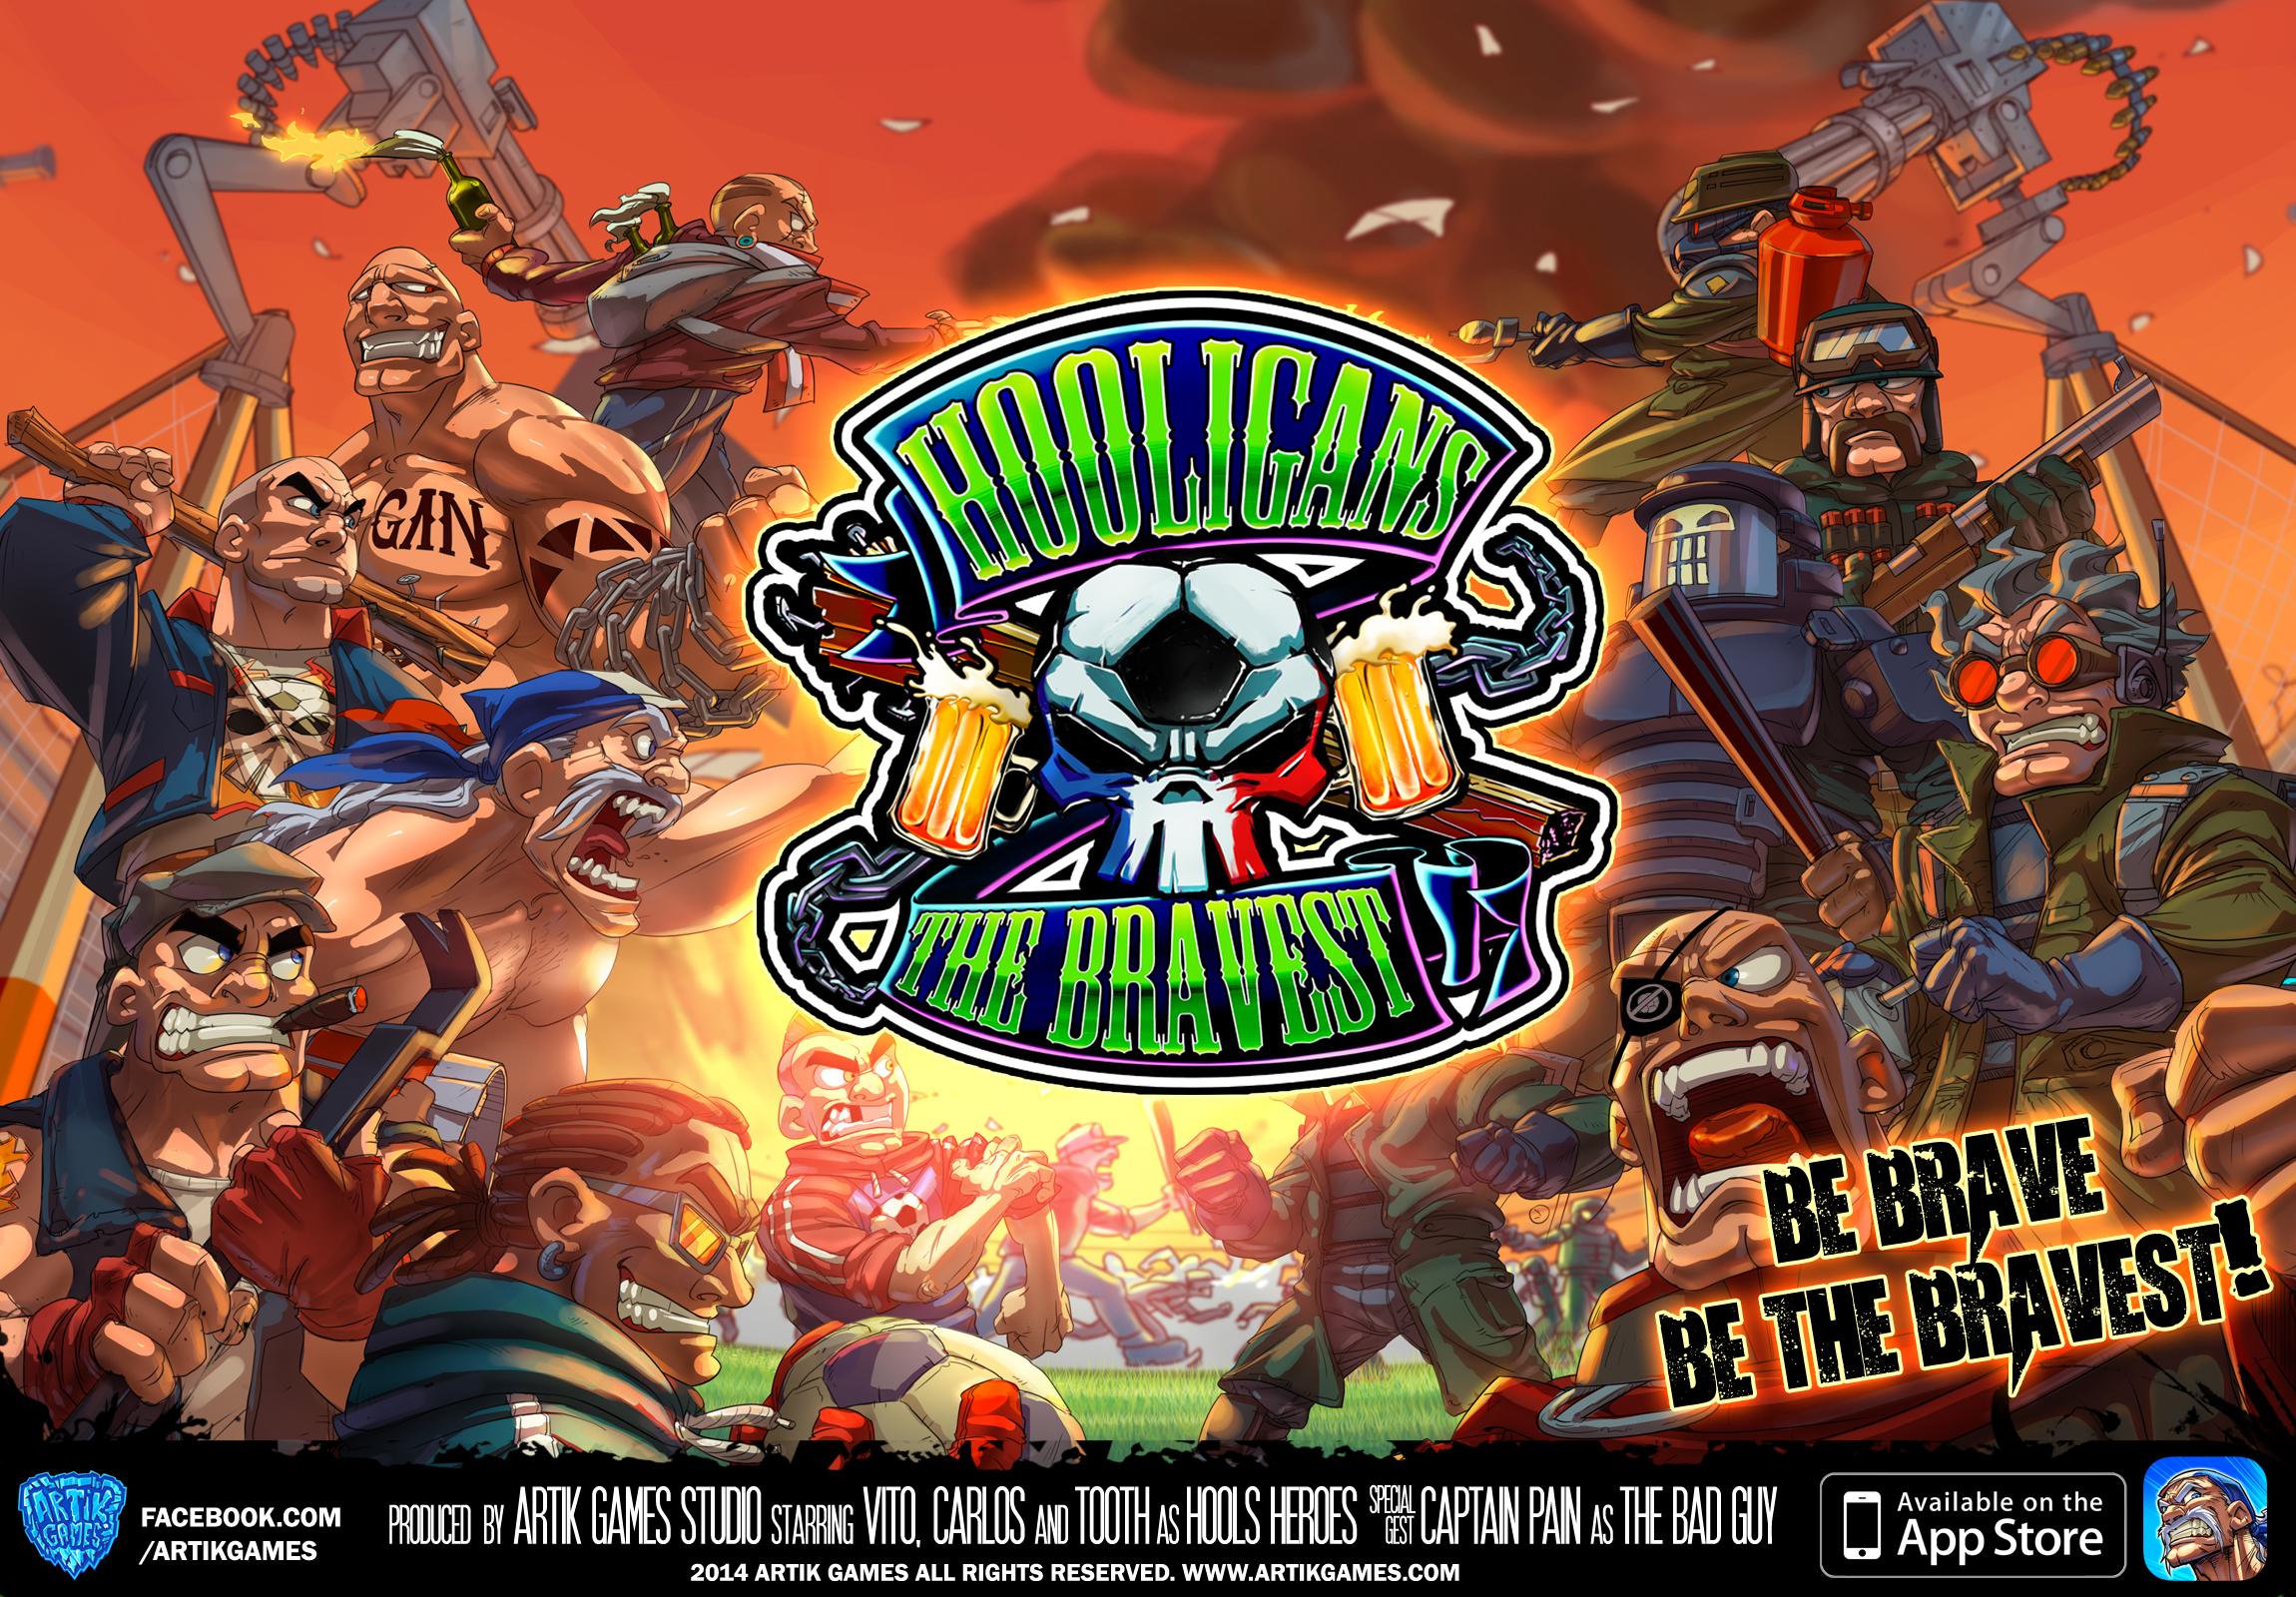 Hooligans : The Bravest